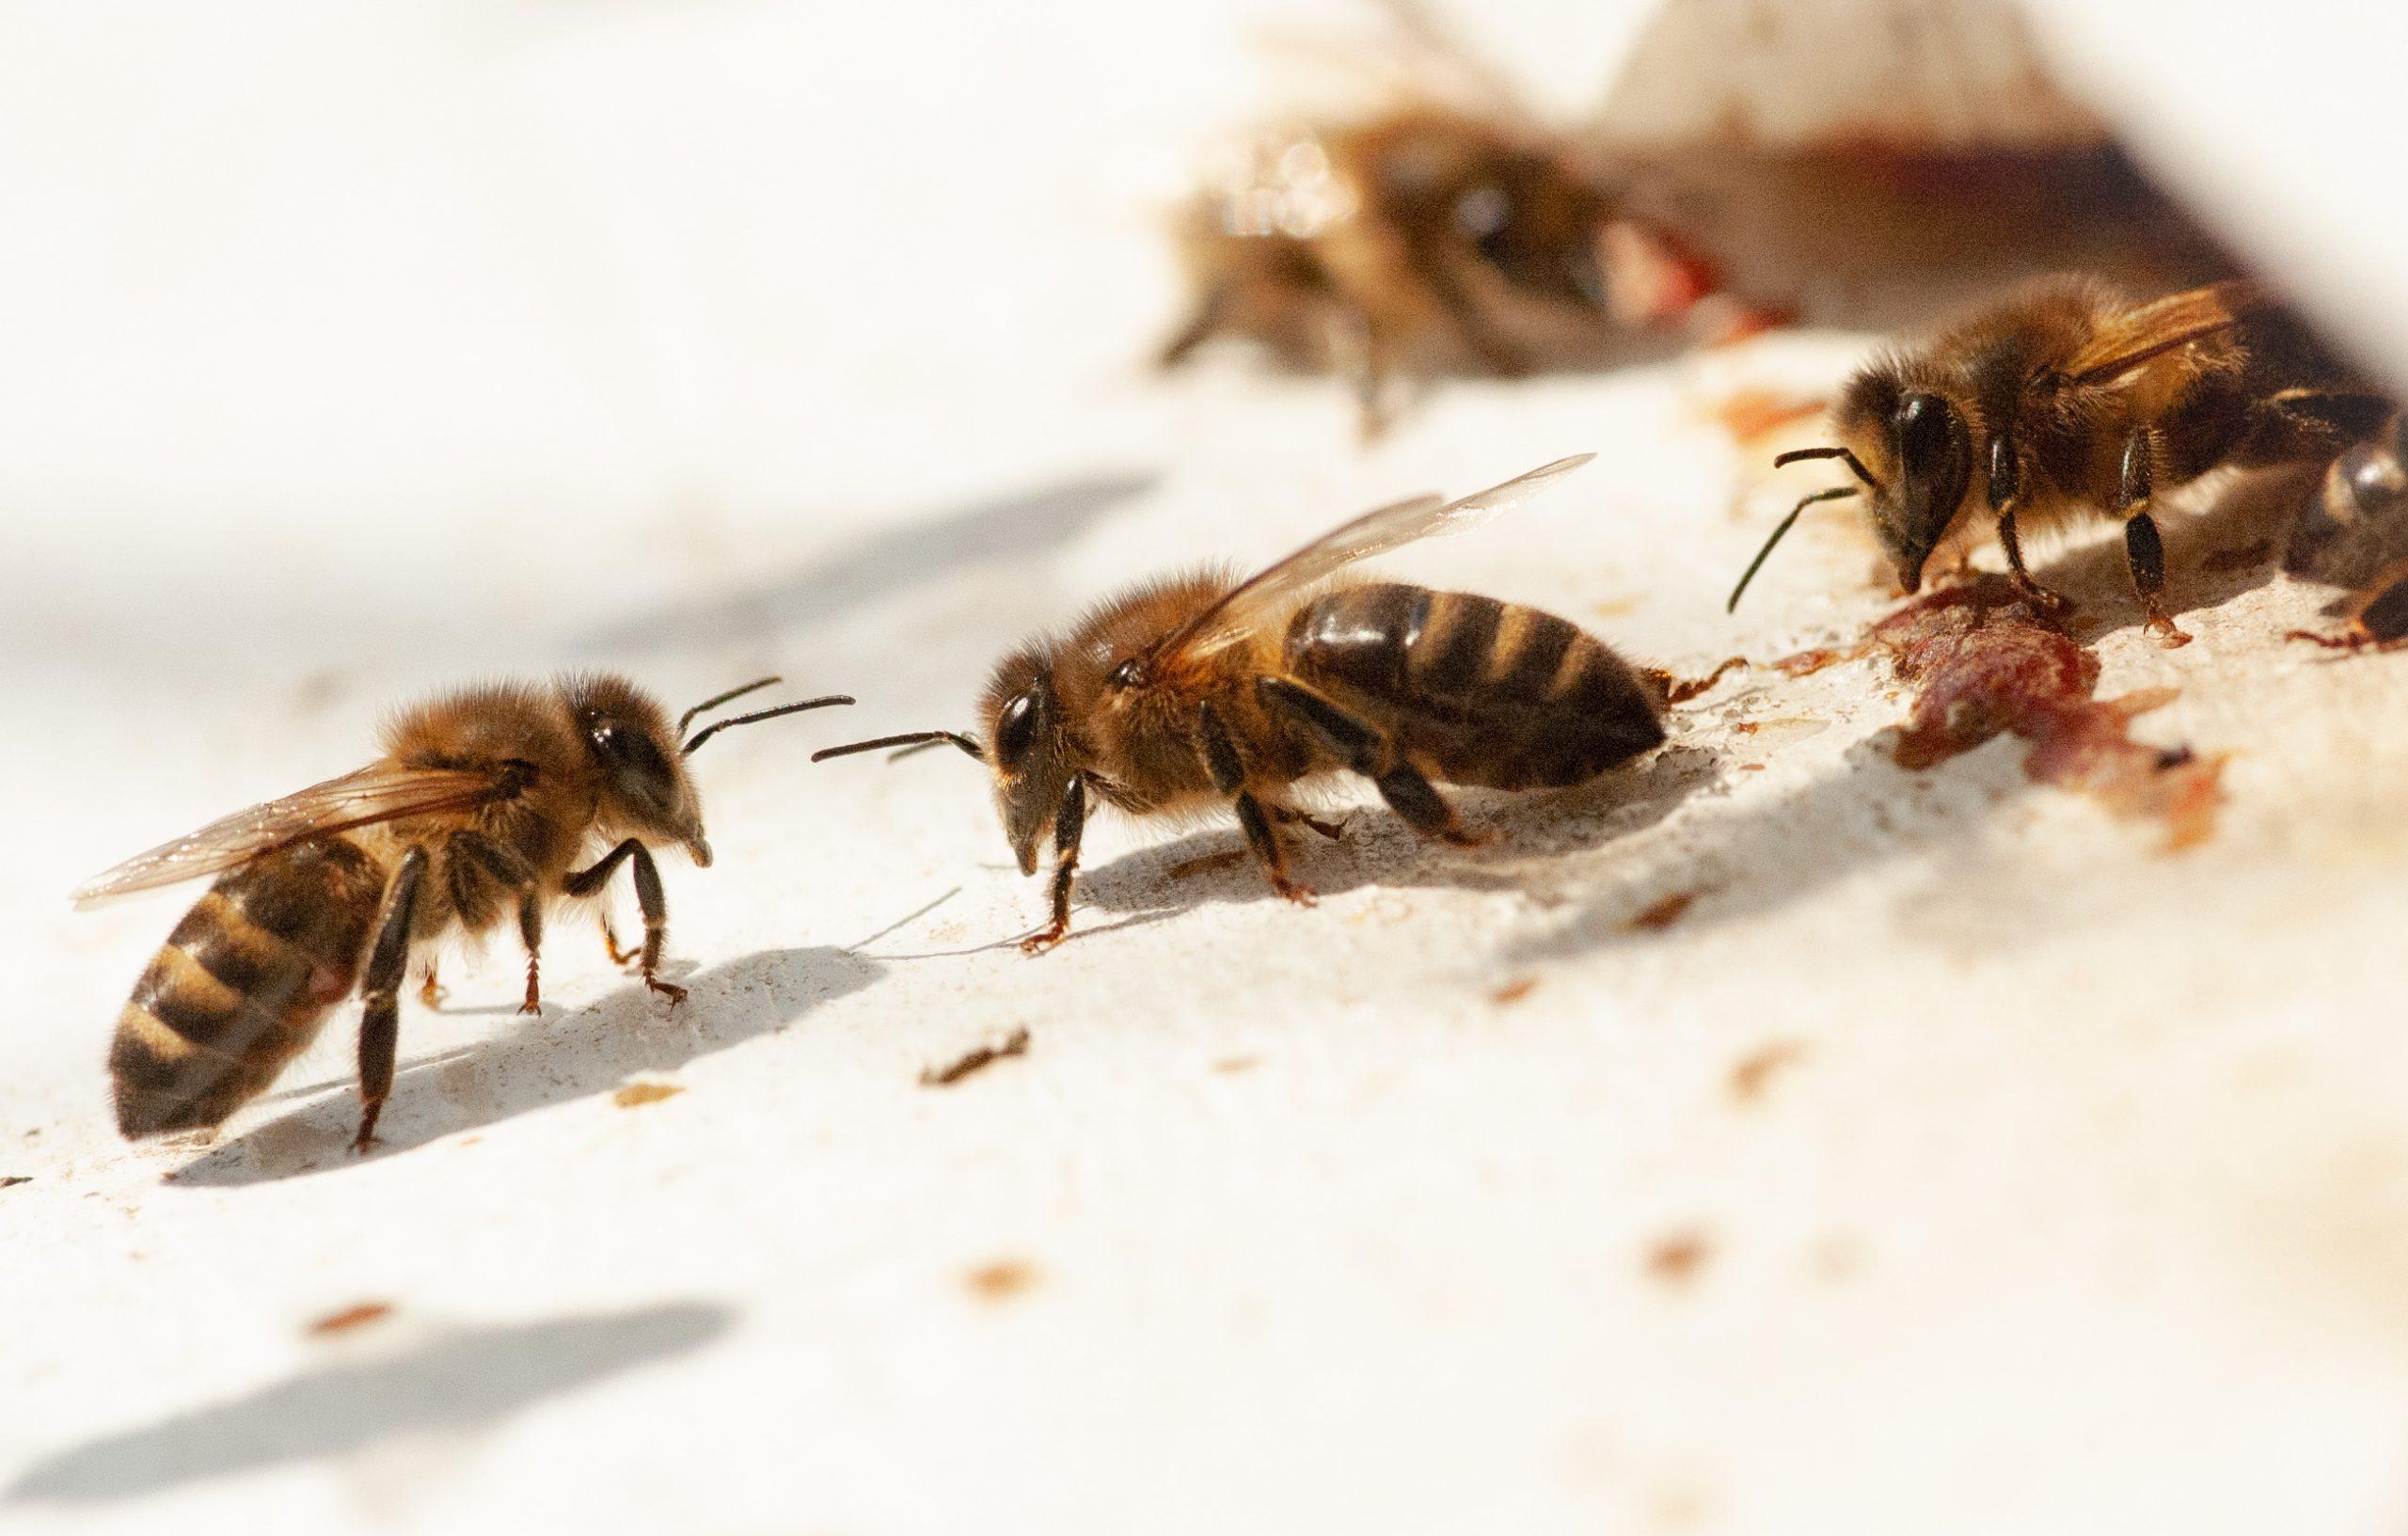 Jakobskruiskruid en giftige honing?ningbij